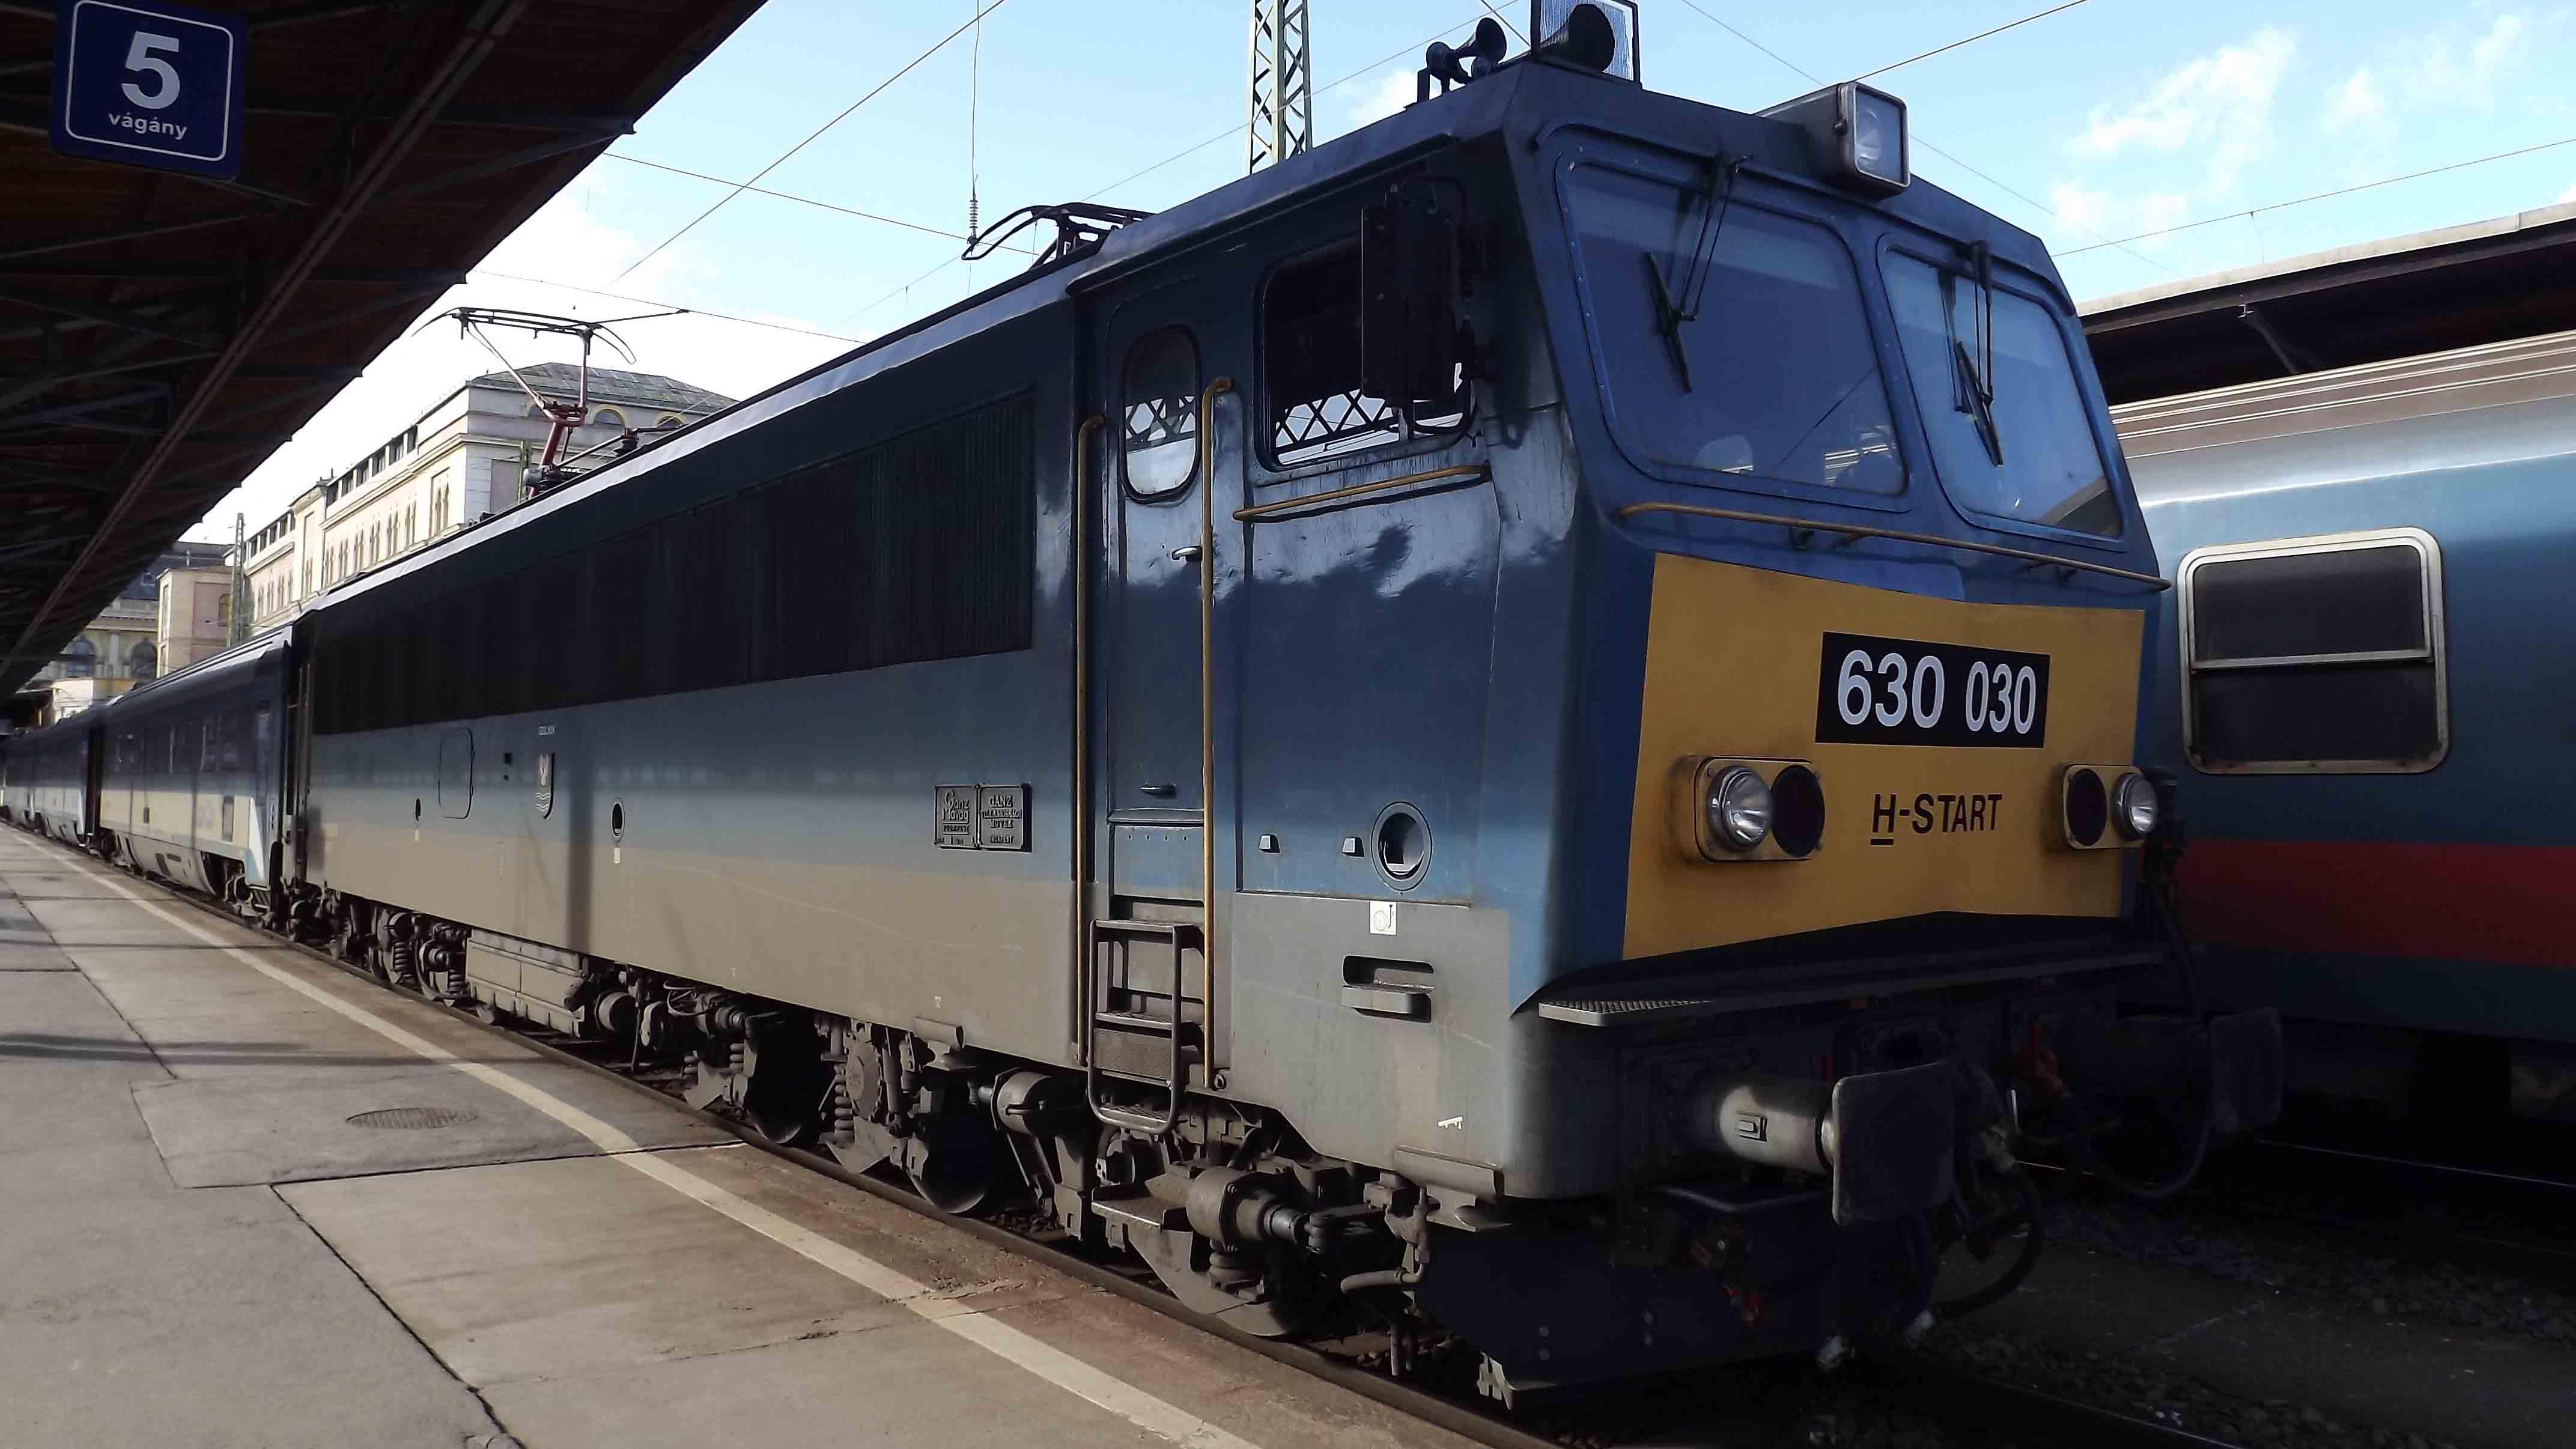 Jamie-Anderson-Continental-Traction-MAV-Class-630